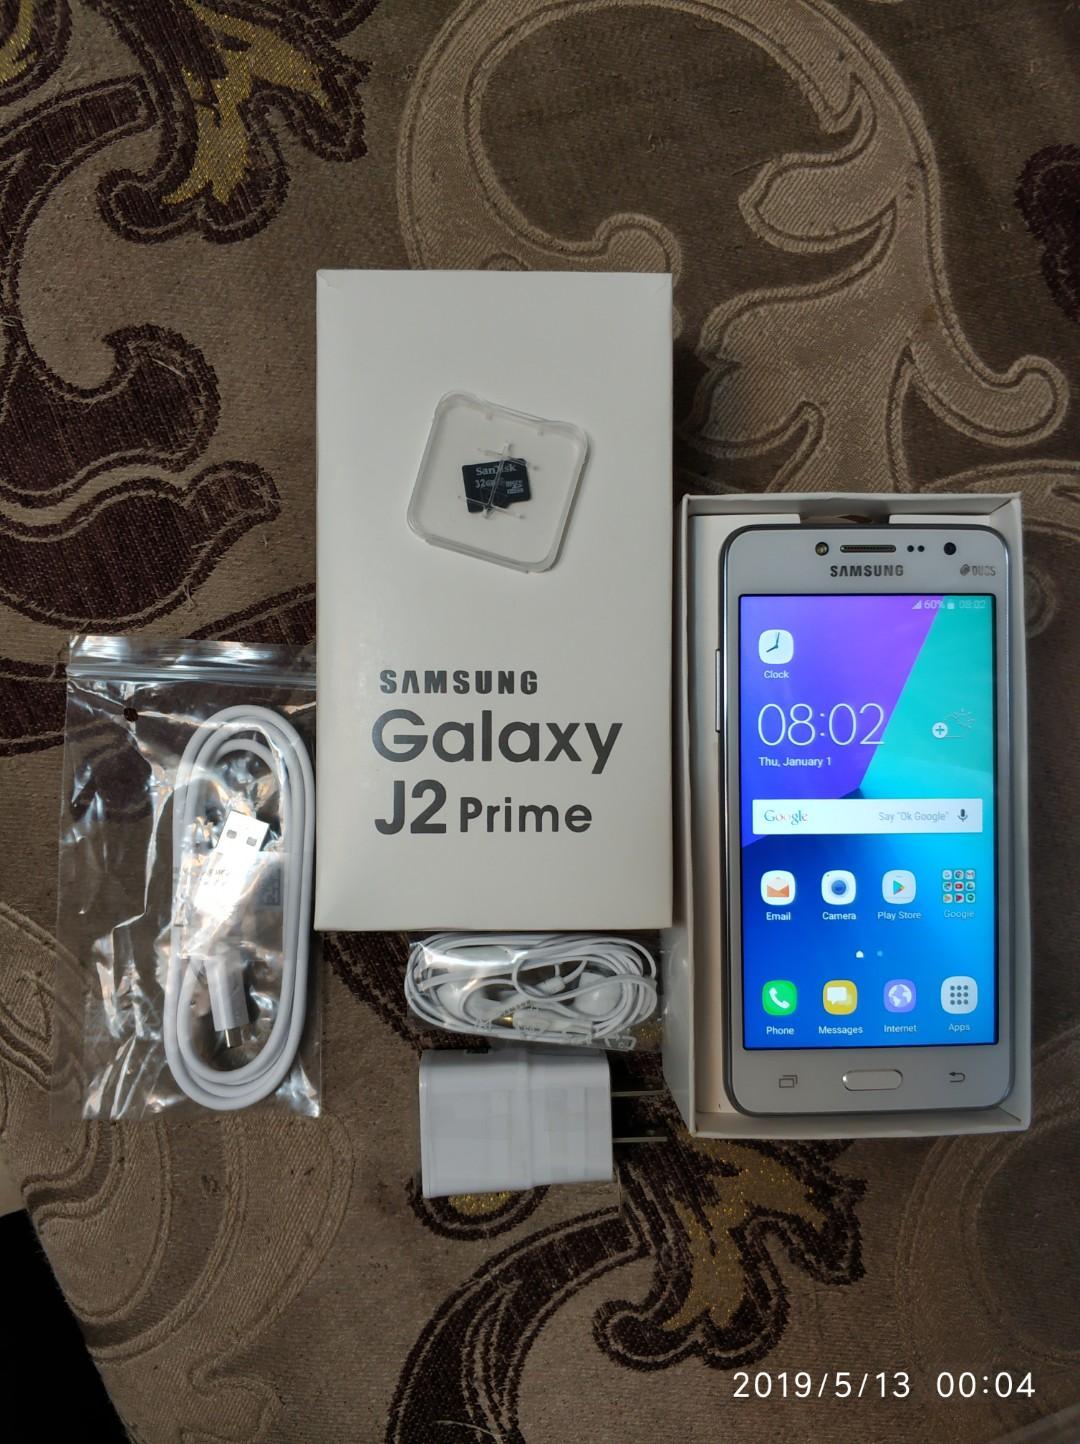 SAMSUNG J2 8GB REM 2GB RAM + 32GB MEMORY CARD FULLY NEW CHARGER+HEADPHONE+BOX OPEN LINE